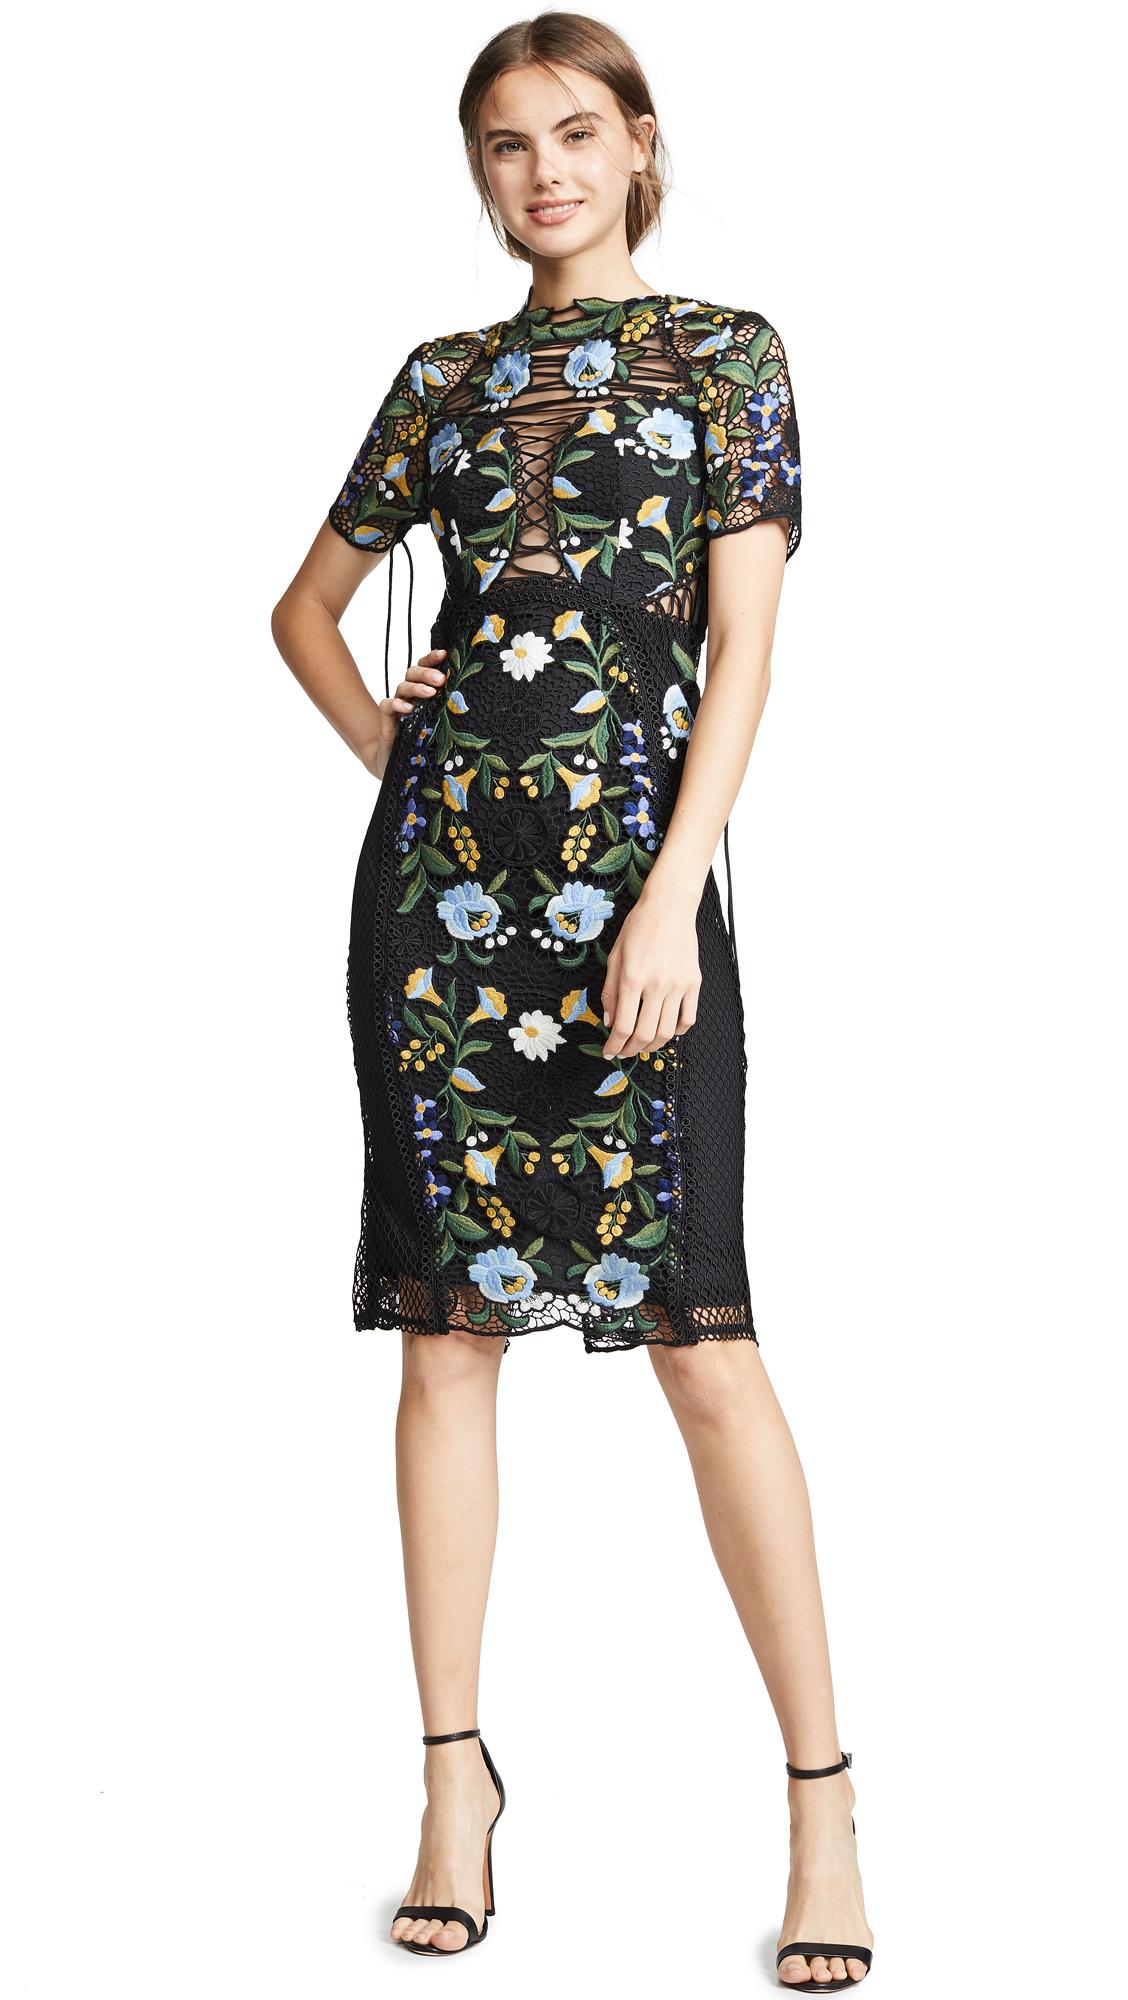 THURLEY Vasette Lace Midi Dress - Blue/Black